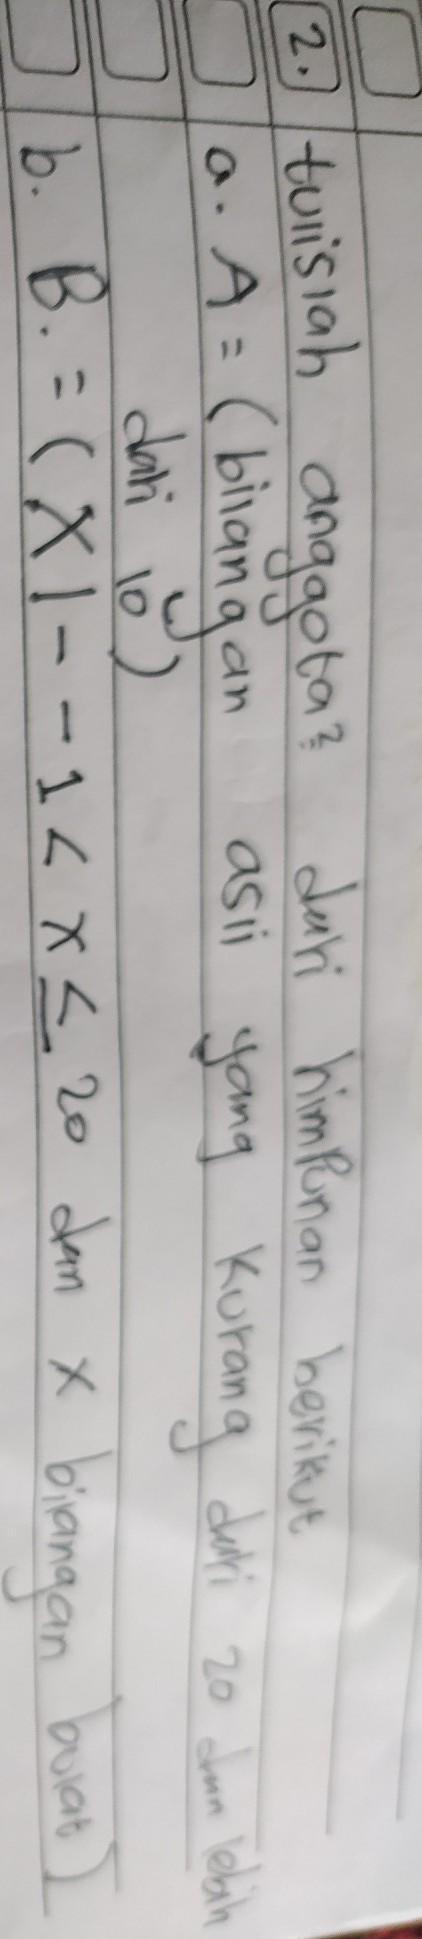 Tulislah Anggota-anggota Dari Himpunan Berikut A : tulislah, anggota-anggota, himpunan, berikut, Tulislah, Anggota-anggota, Himpunan, Berikut, A.A=(bilangan, Kurang, Lebih, Brainly.co.id